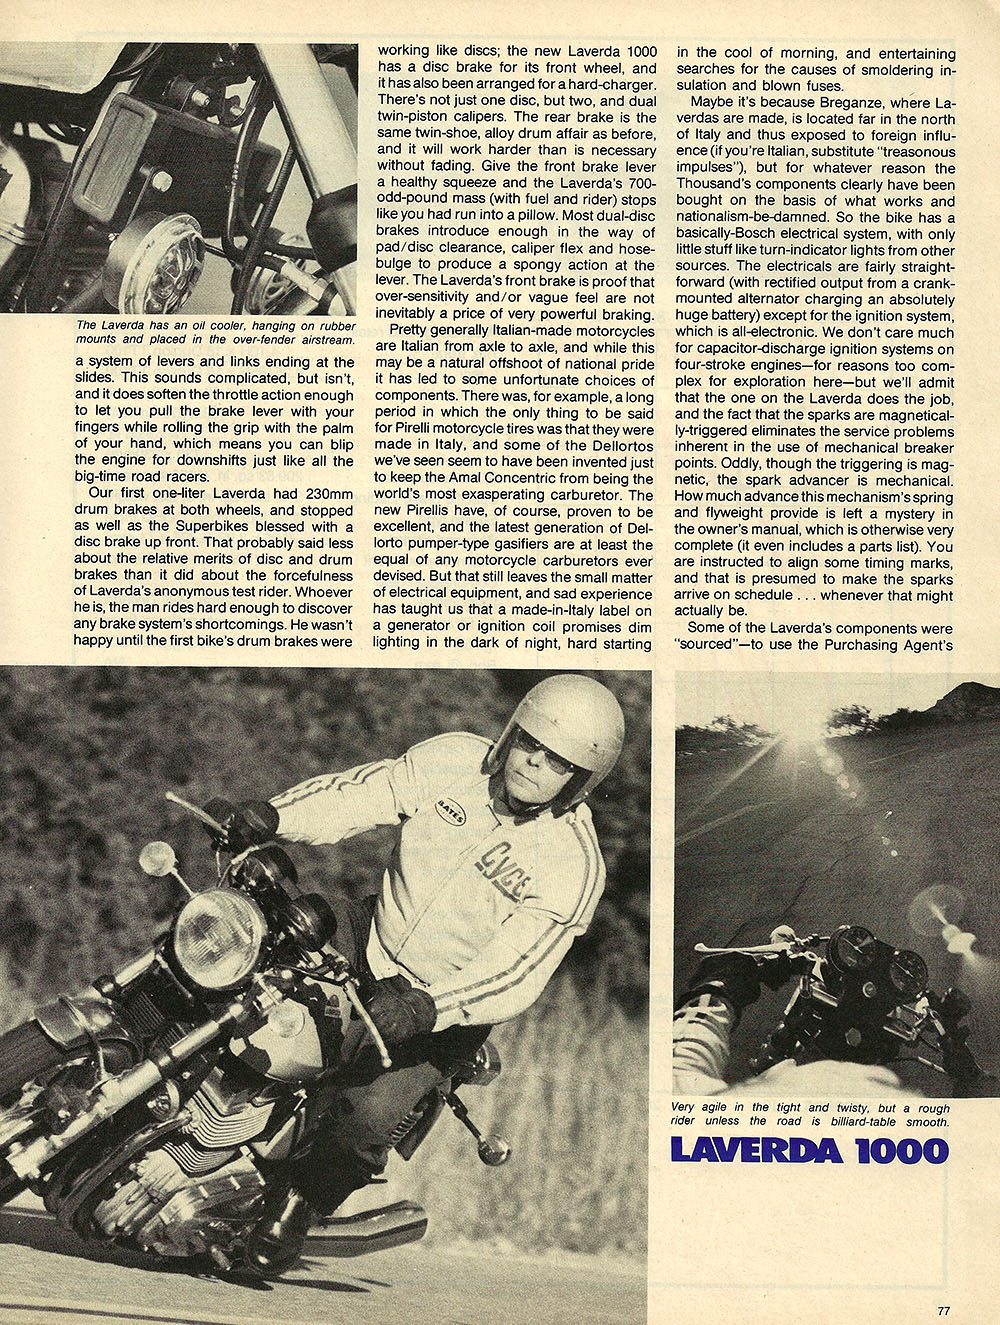 1976 Laverda 1000 road test 3.JPG